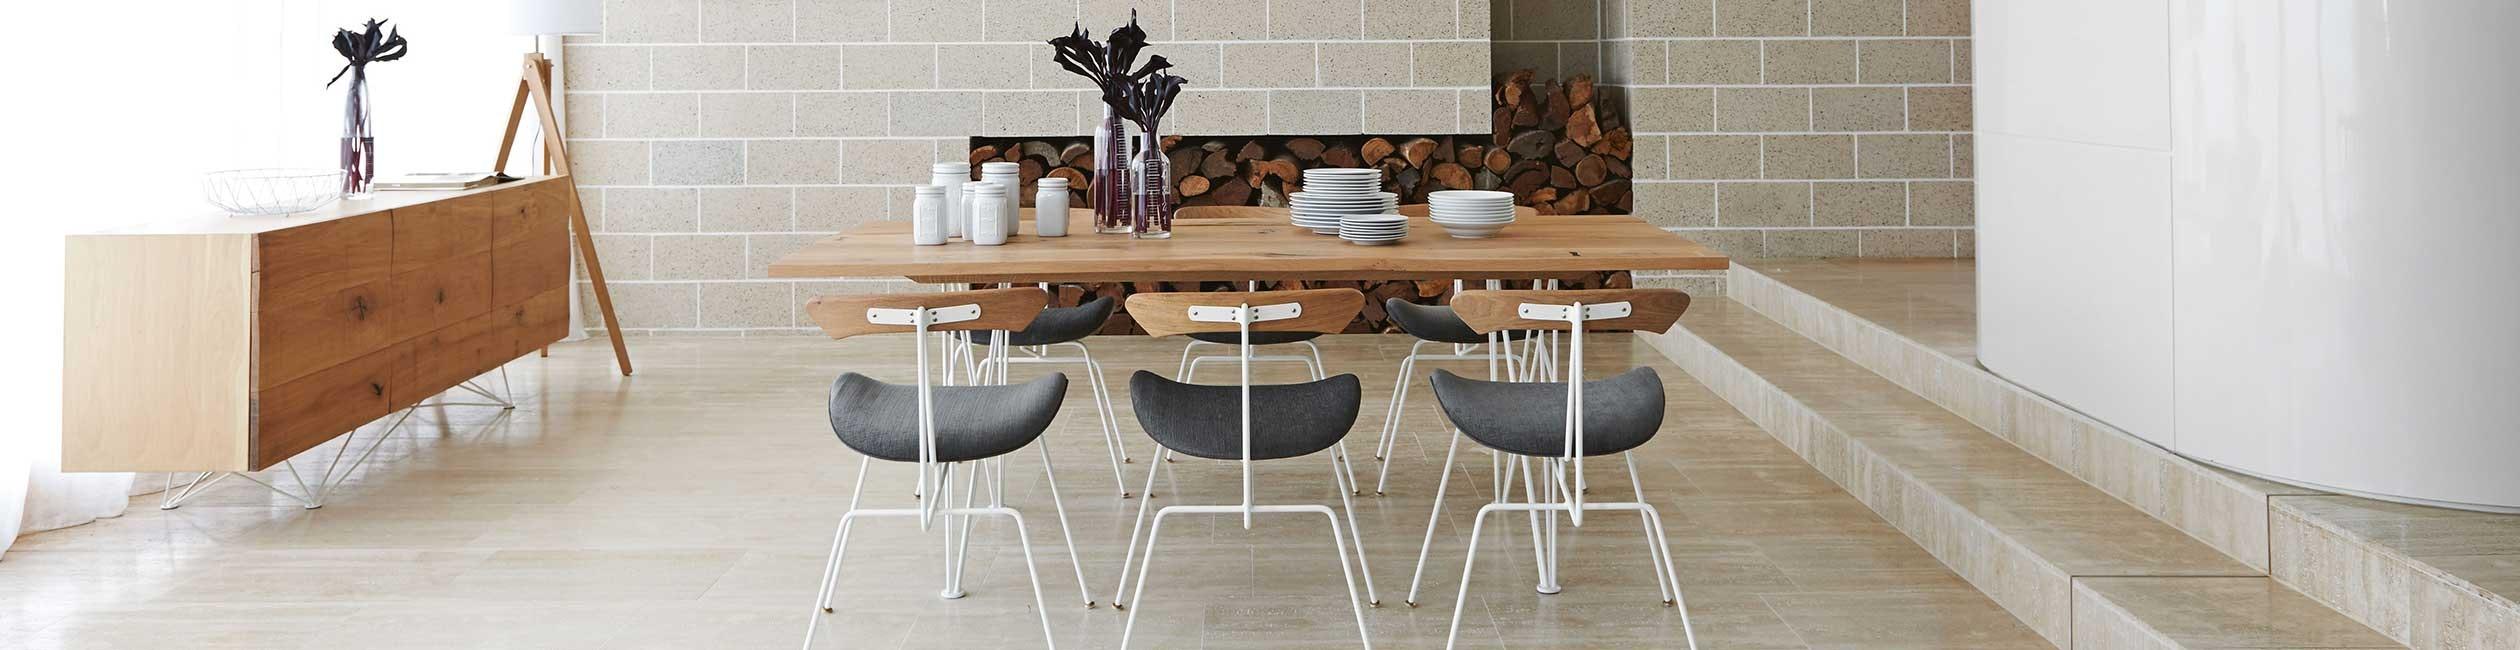 Furniture; Dining